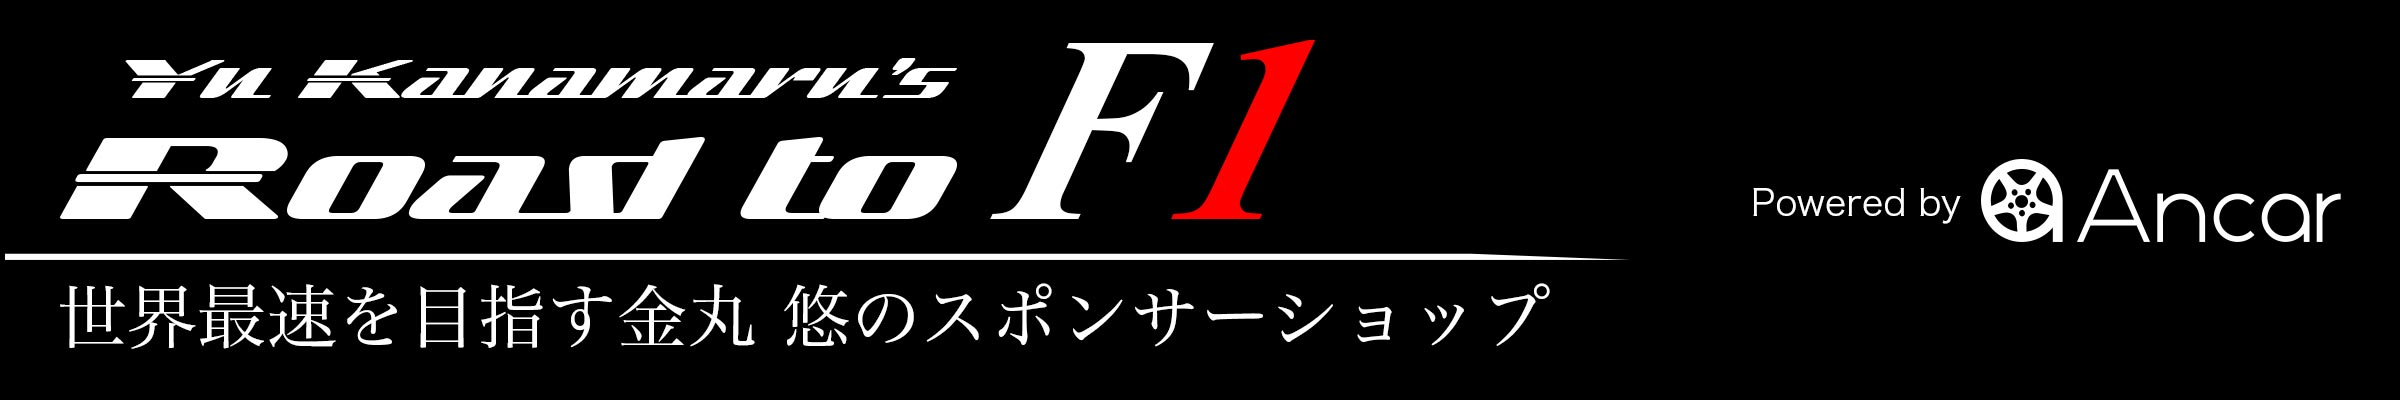 Yu Kanamaru Sponsor Shop by Ancar